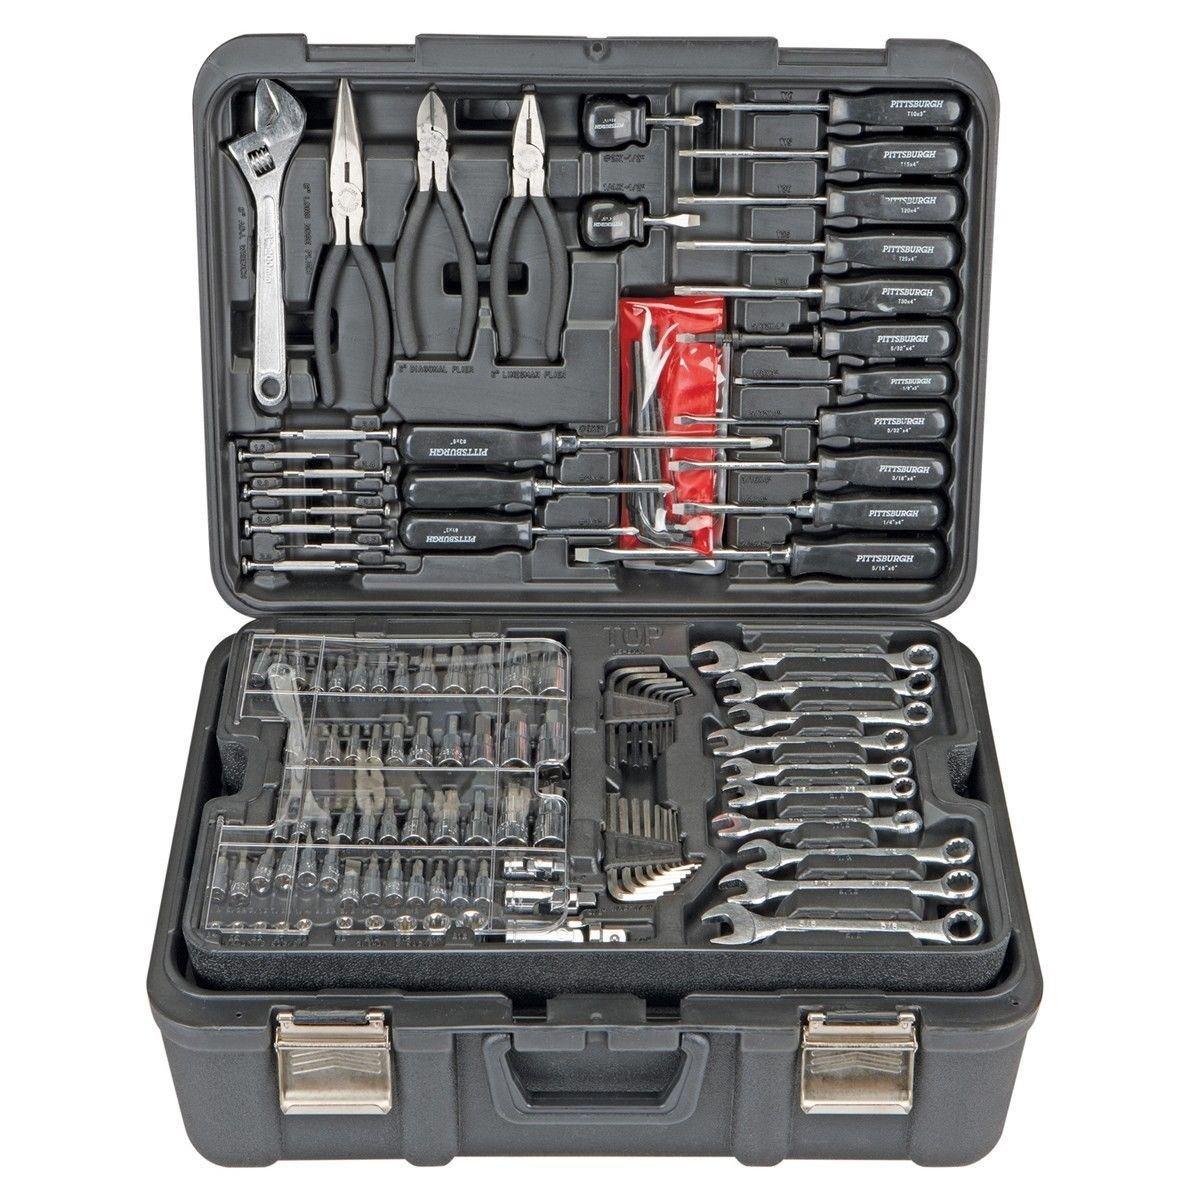 Professional 301 Piece Mechanic's Tool Kit Set - Shop Garage Vehicle Repair